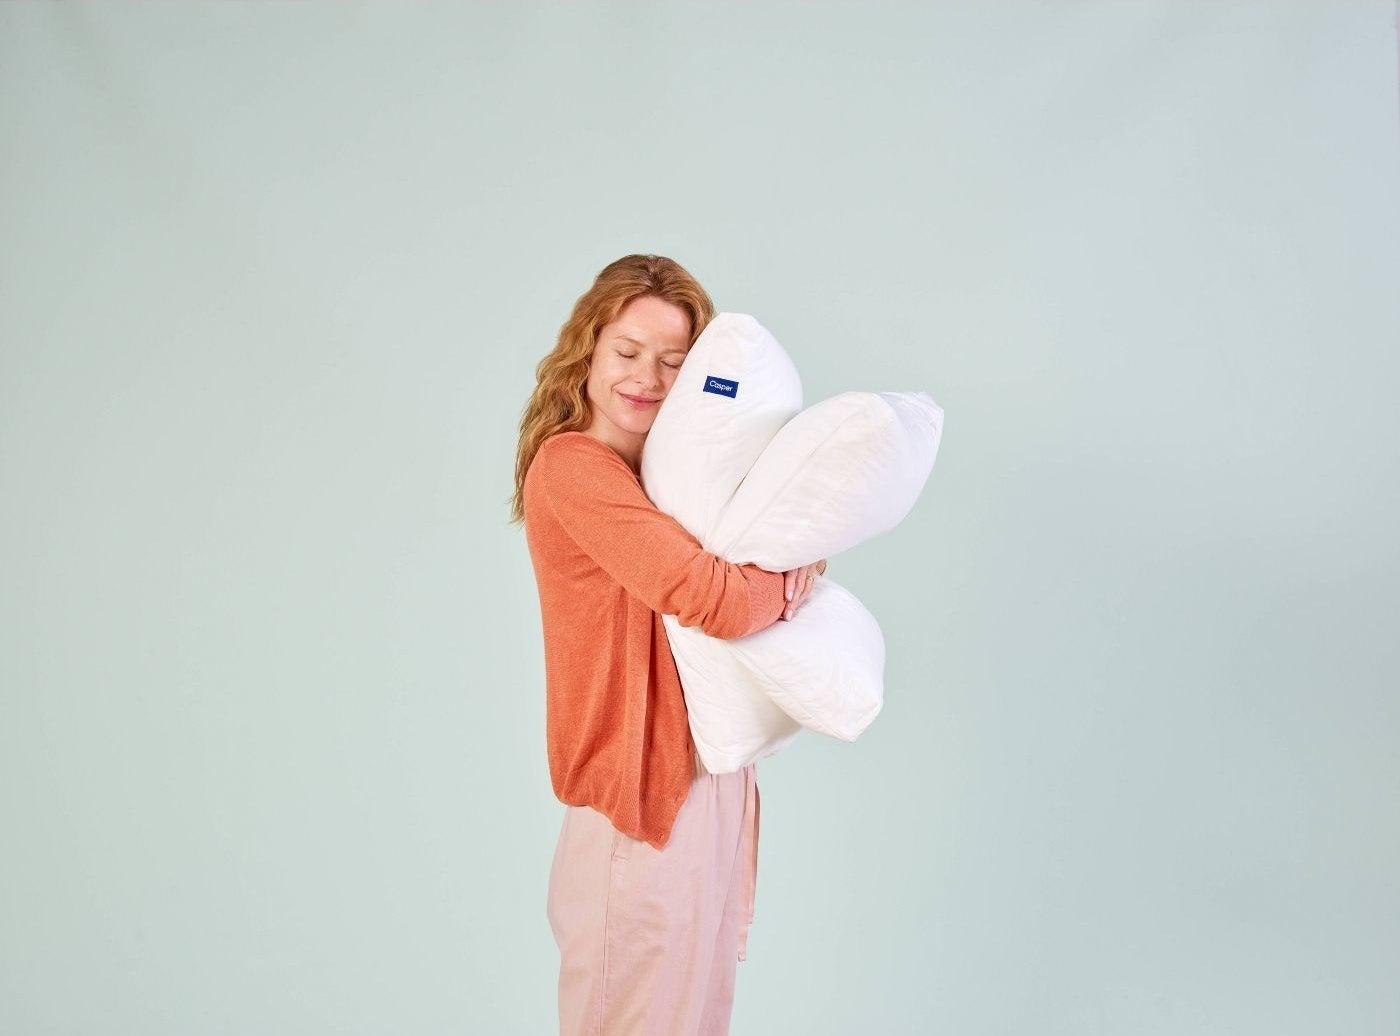 A model cuddling the pillow